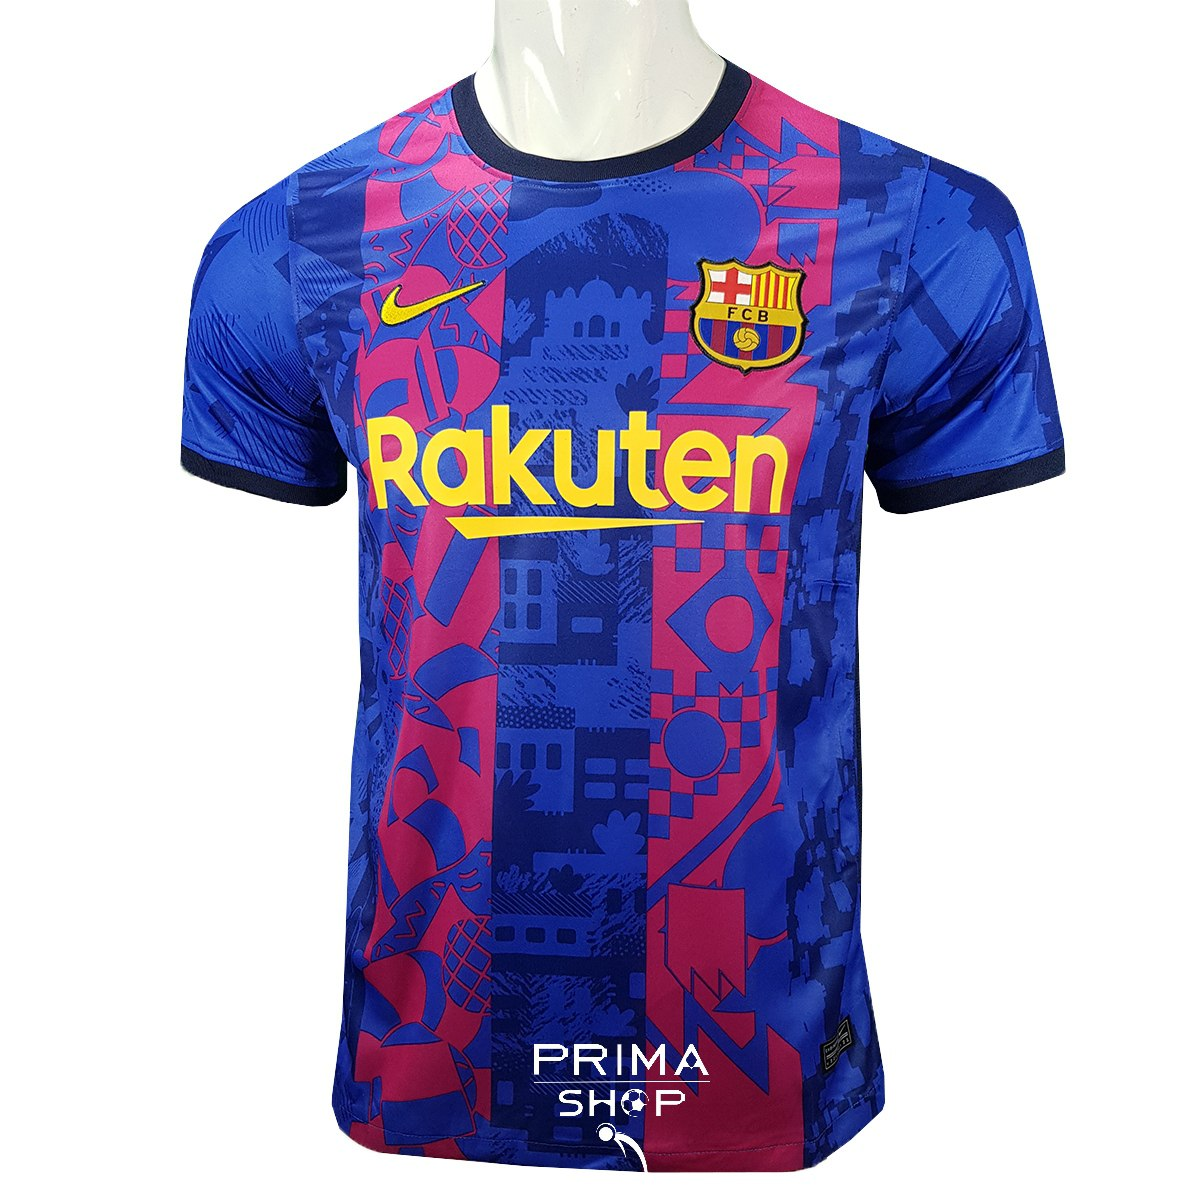 لباس بارسلونا اروپایی